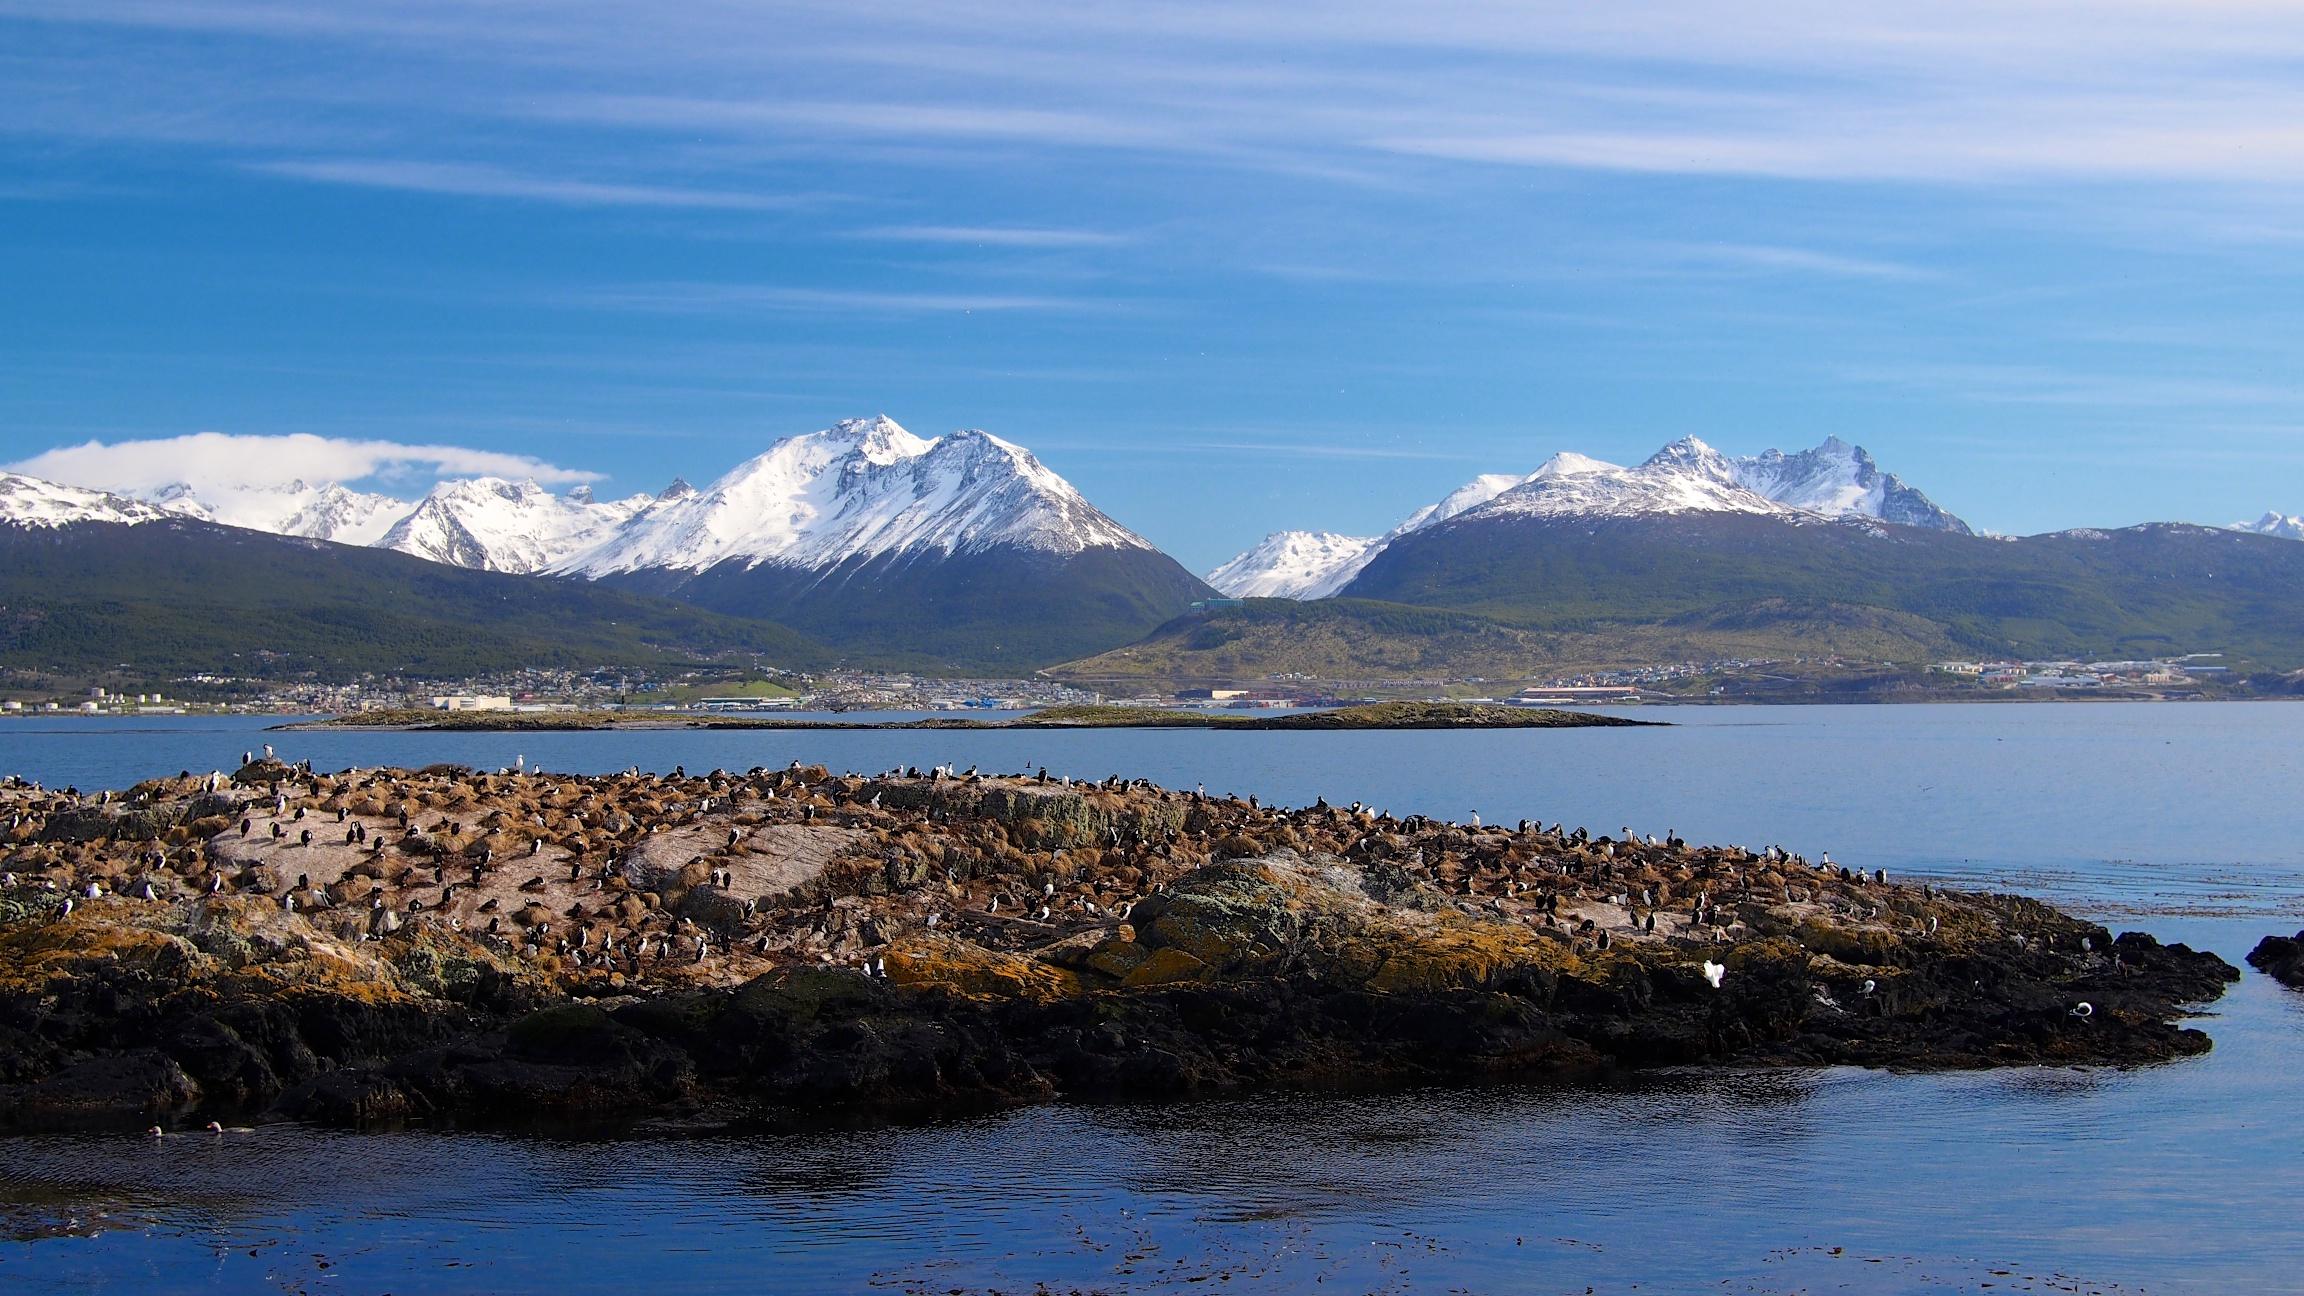 Islets full of sea lions and cormorants